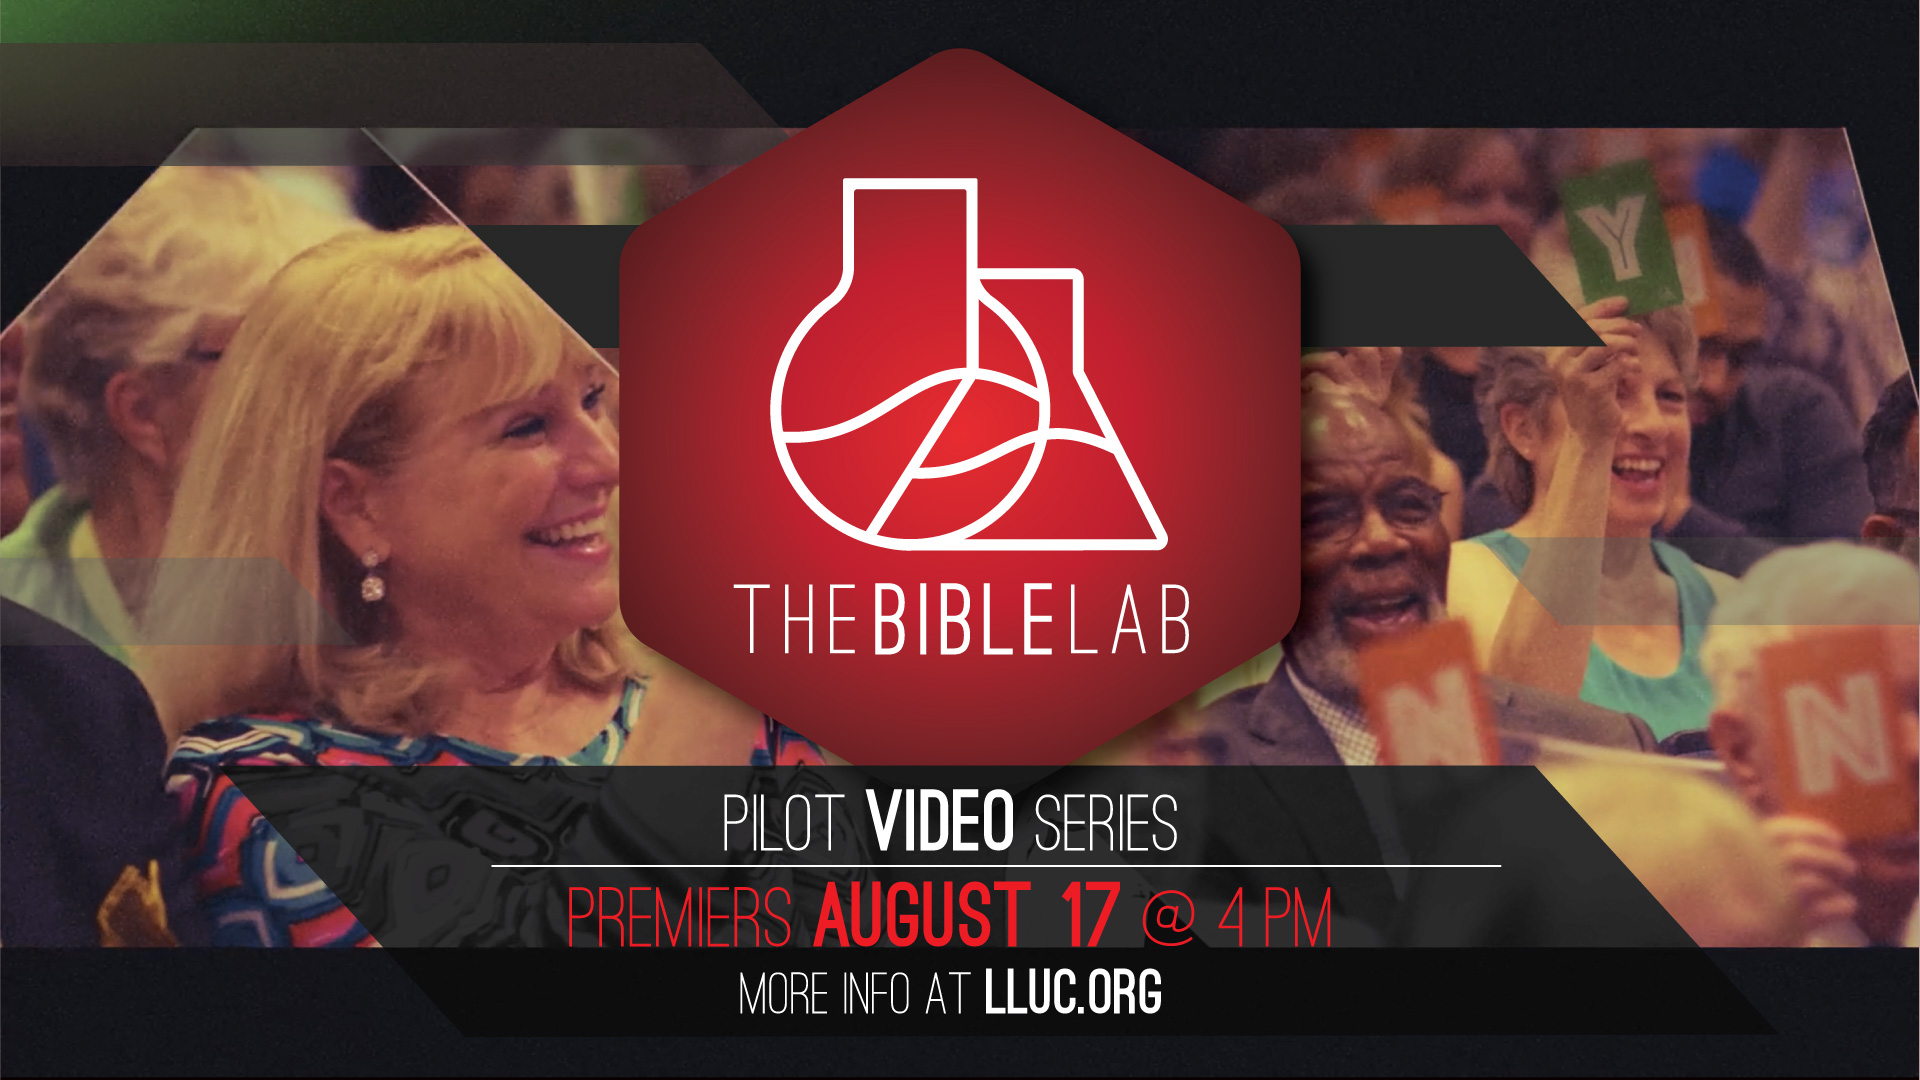 Pilot Video Series -